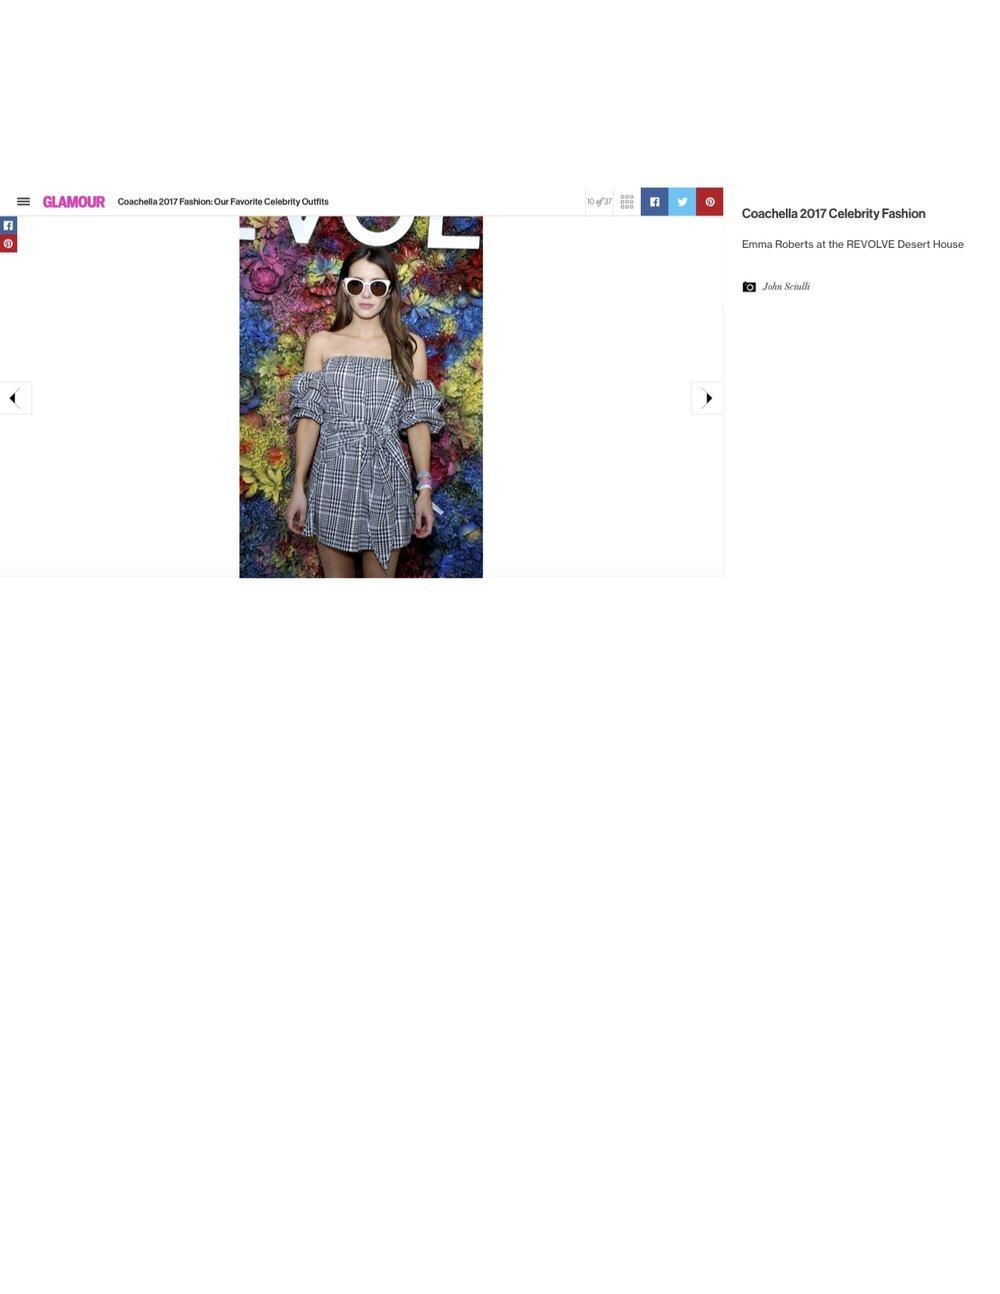 GLAMOUR.com - Emma Roberts - REVOLVE Festival.jpg